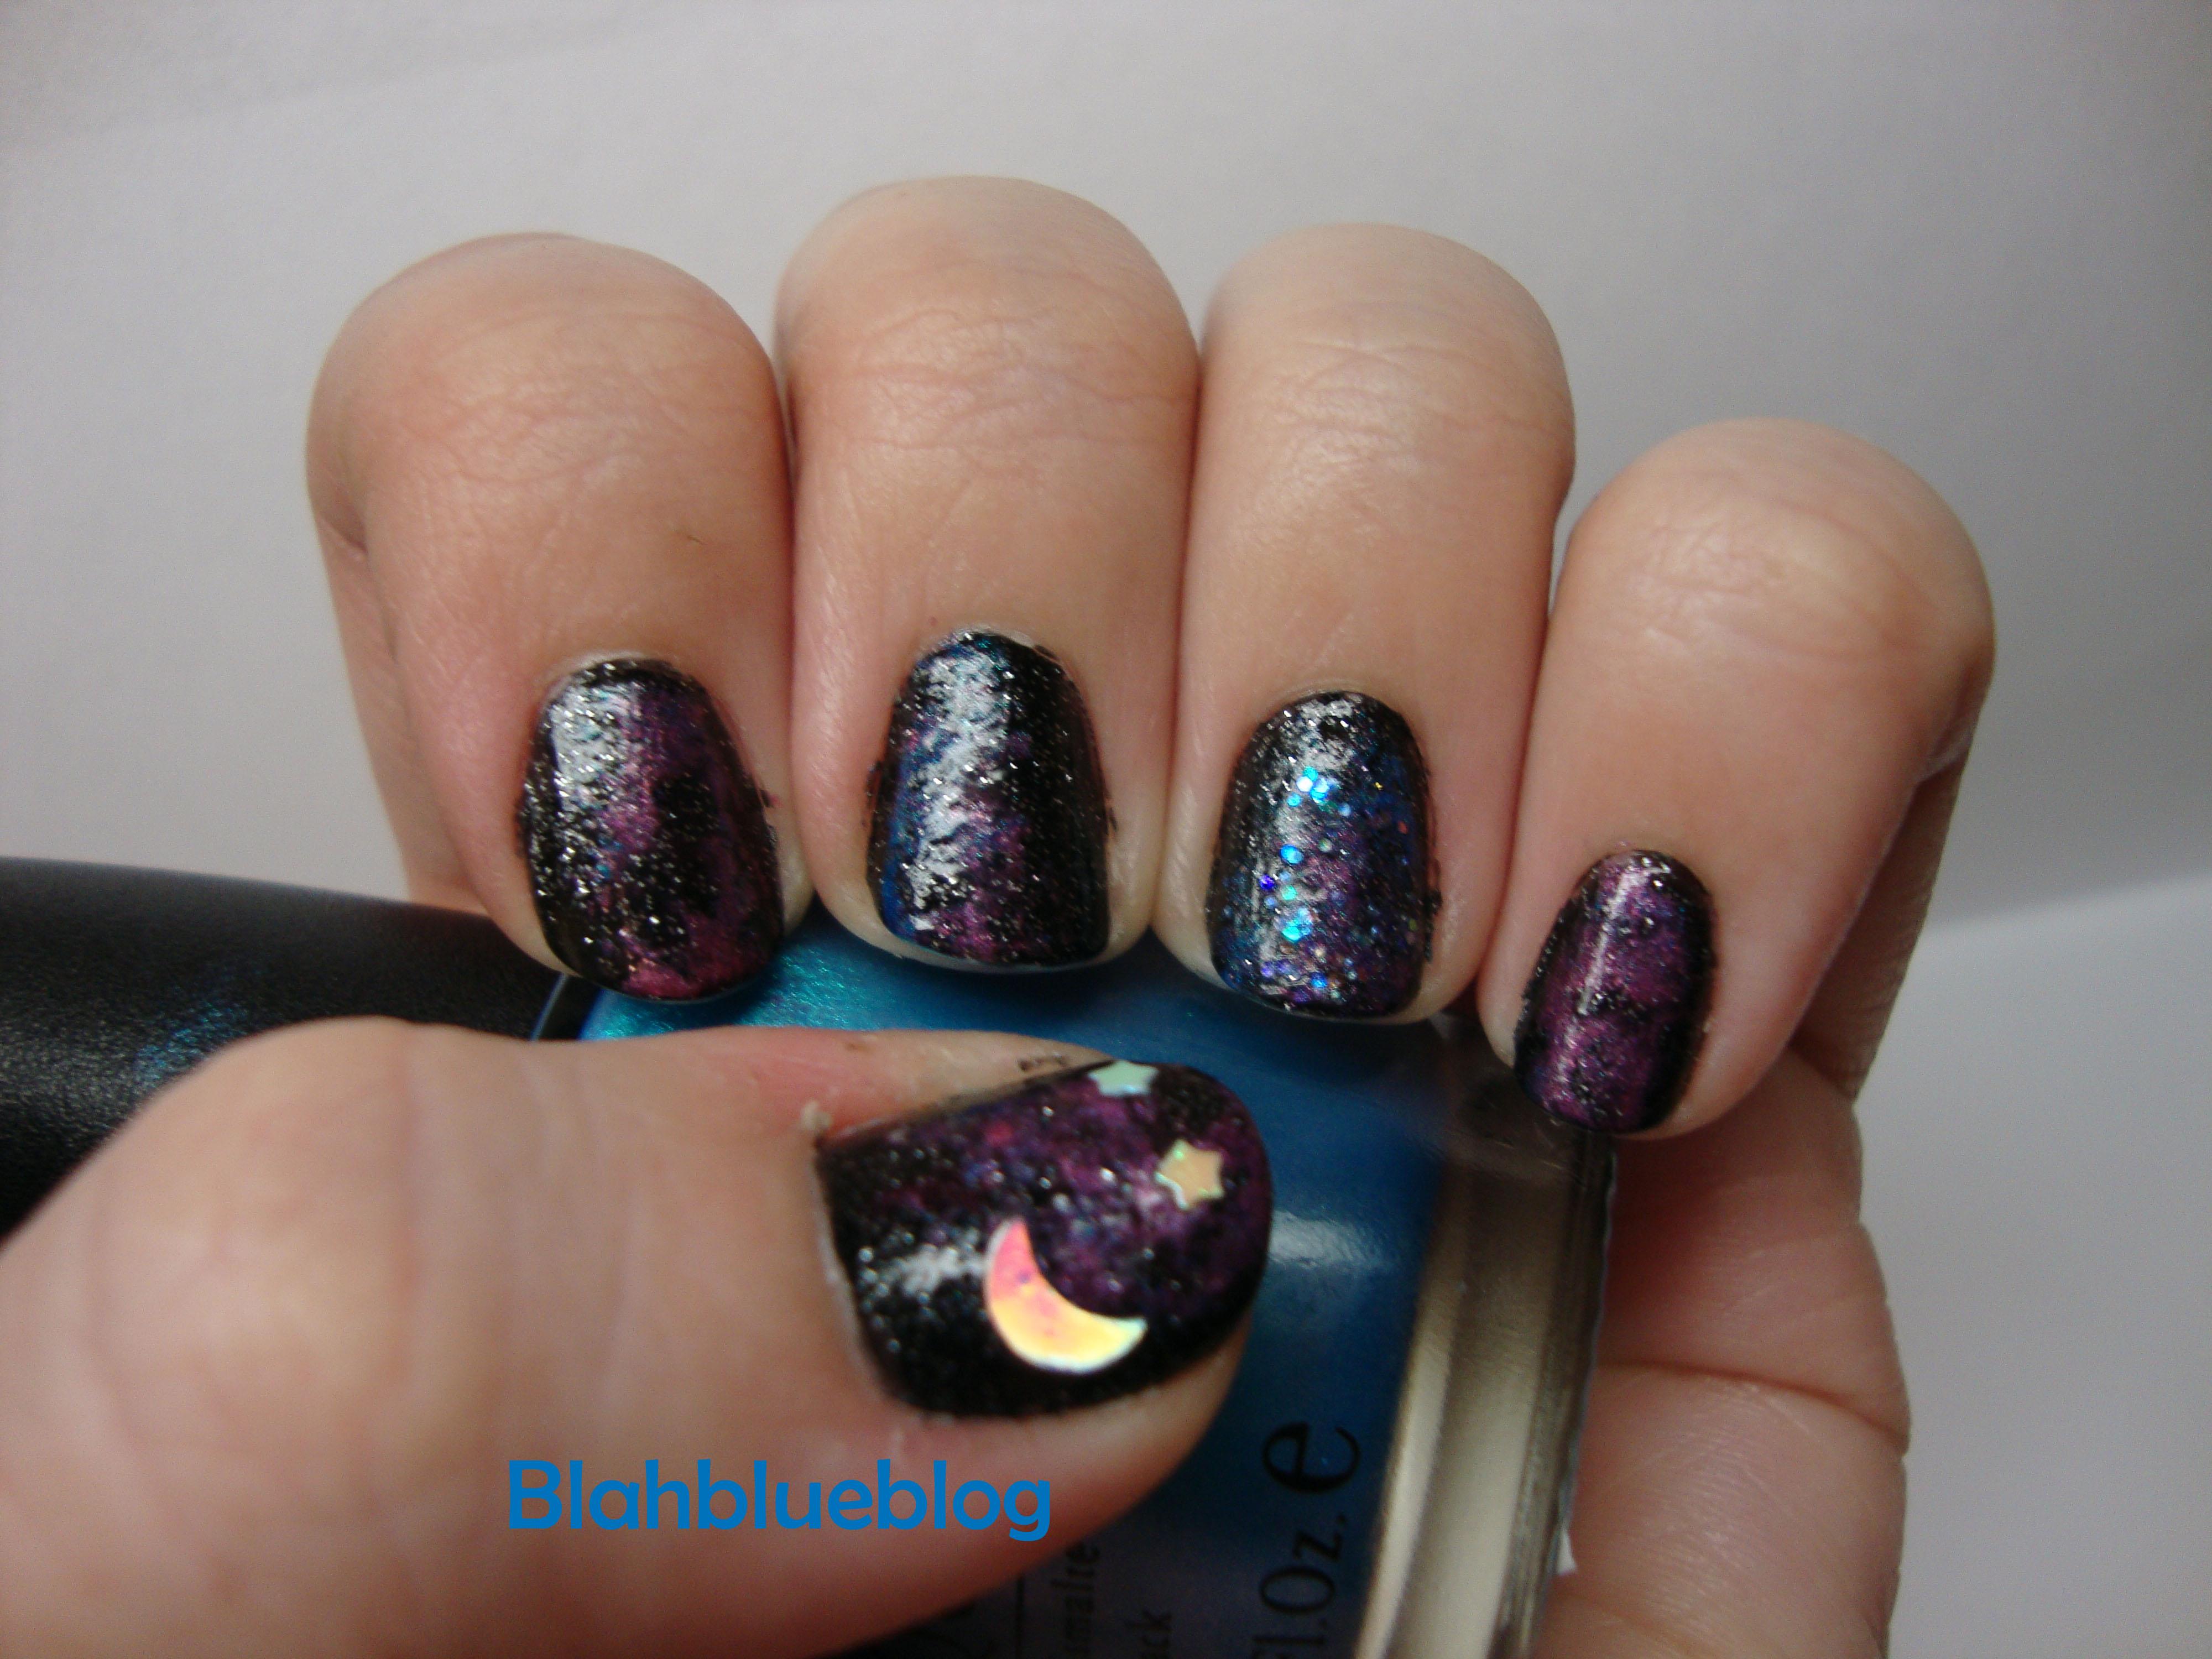 space nails | blahblueblog